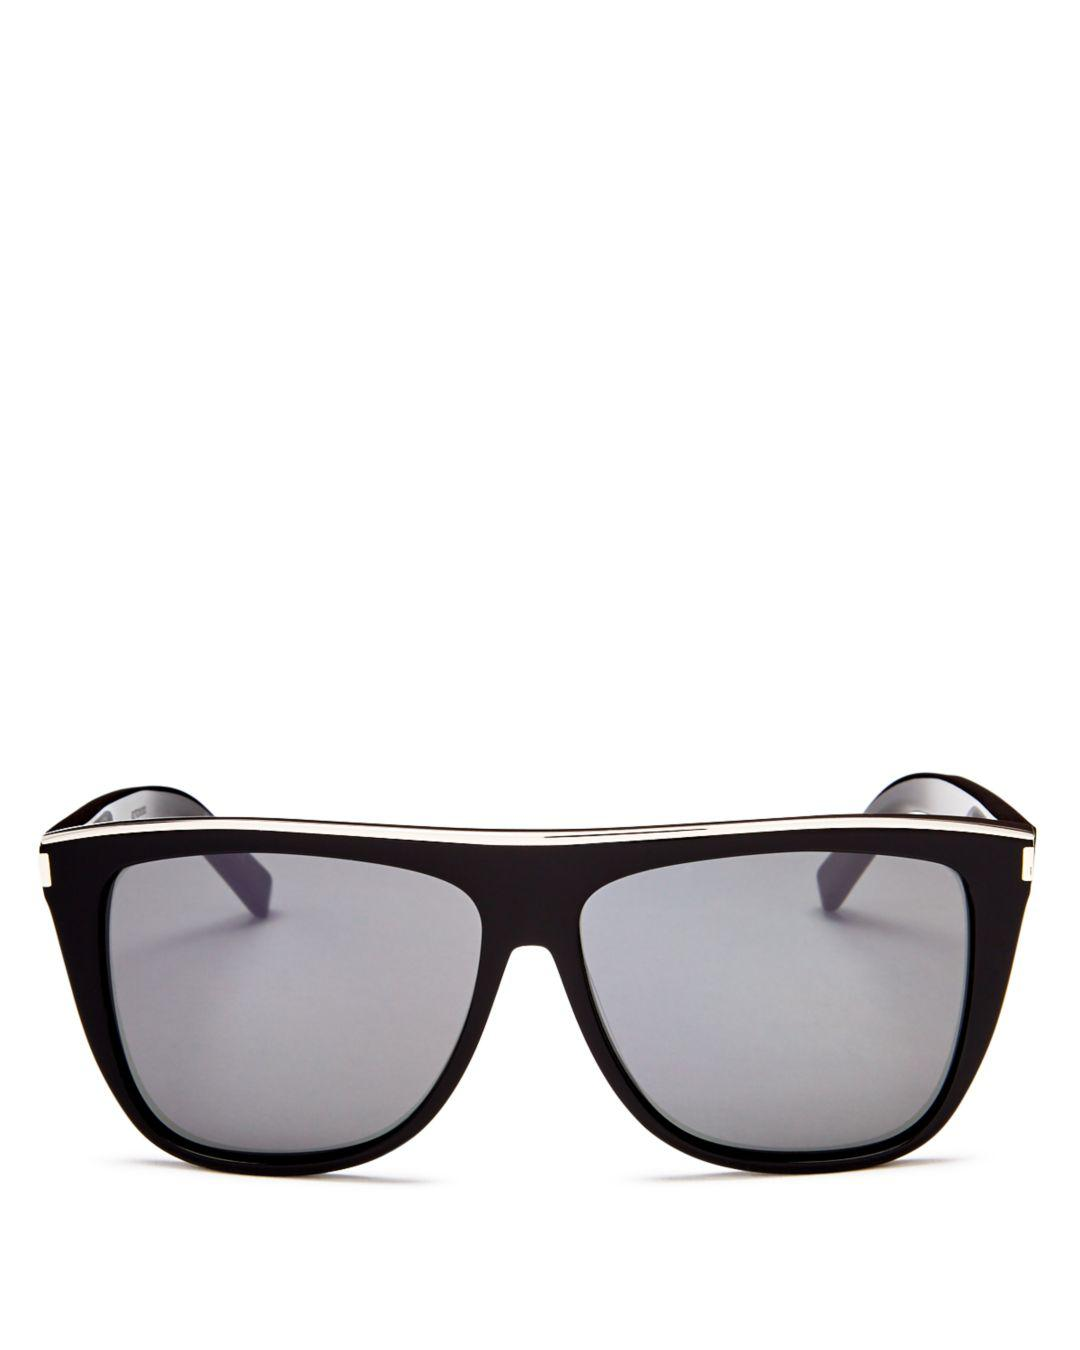 762ec0f461d Saint Laurent Wayfarer Sunglasses in Black for Men - Save ...